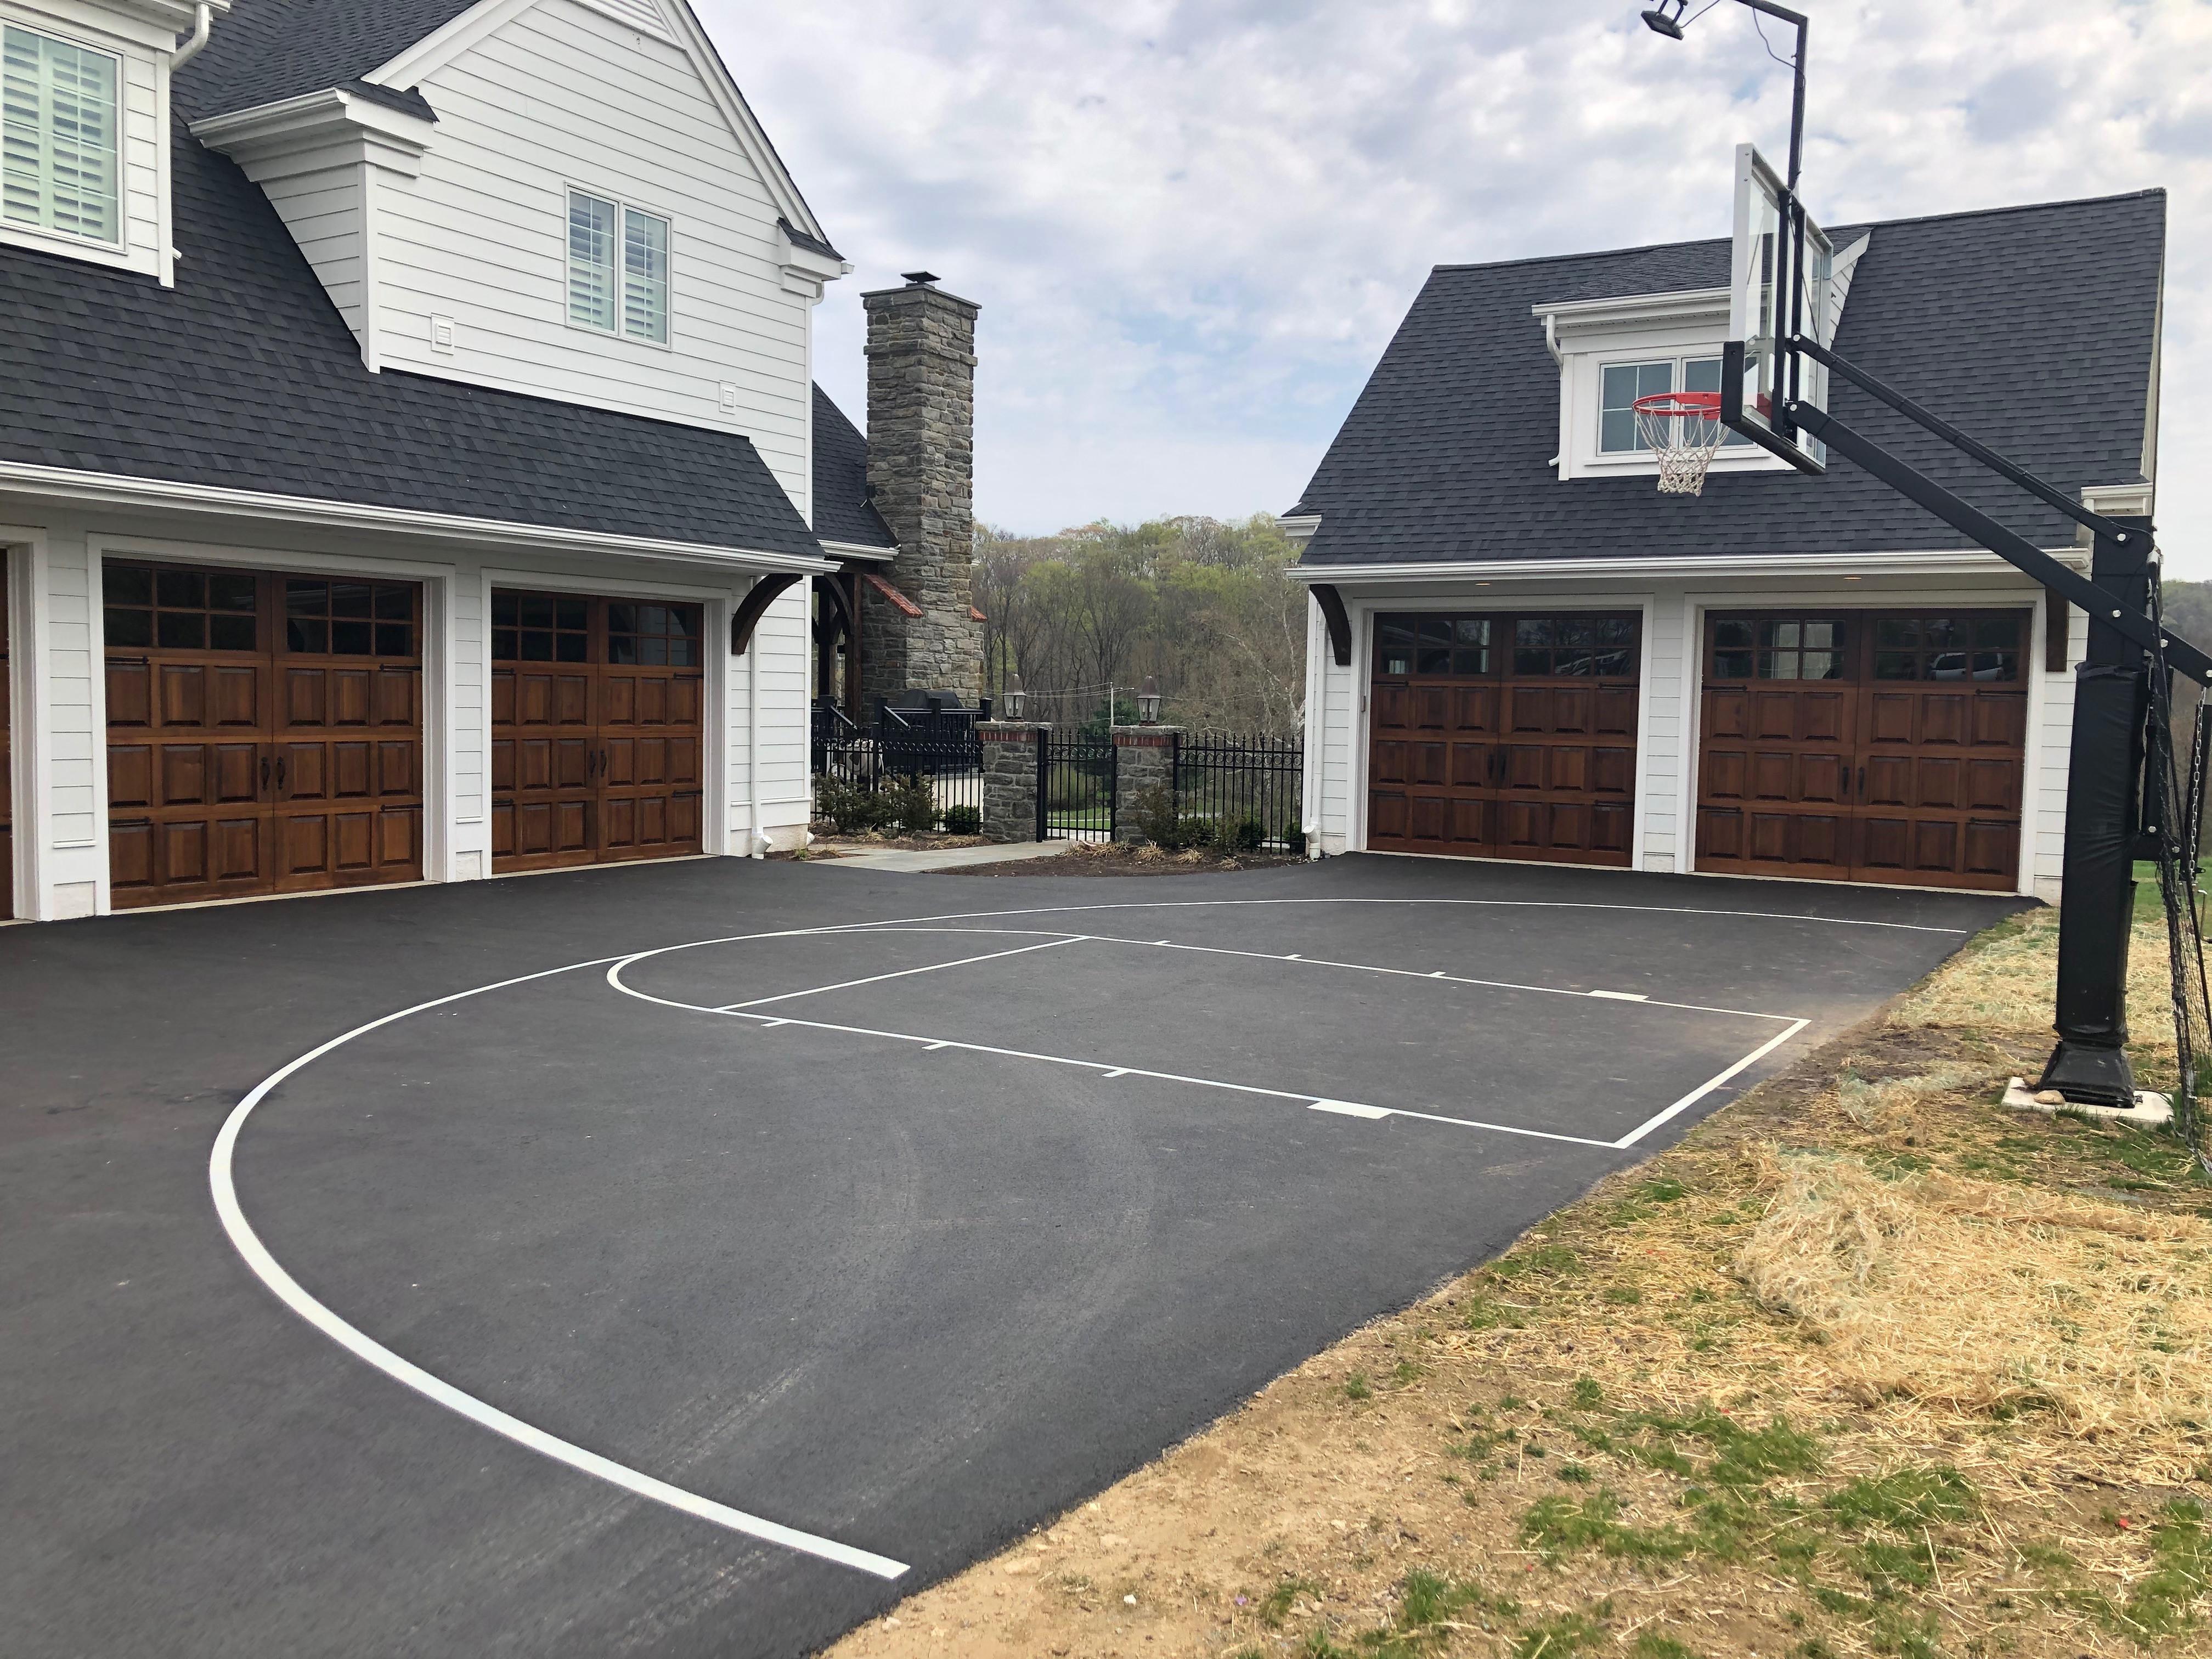 Half Basketball Court (High School)